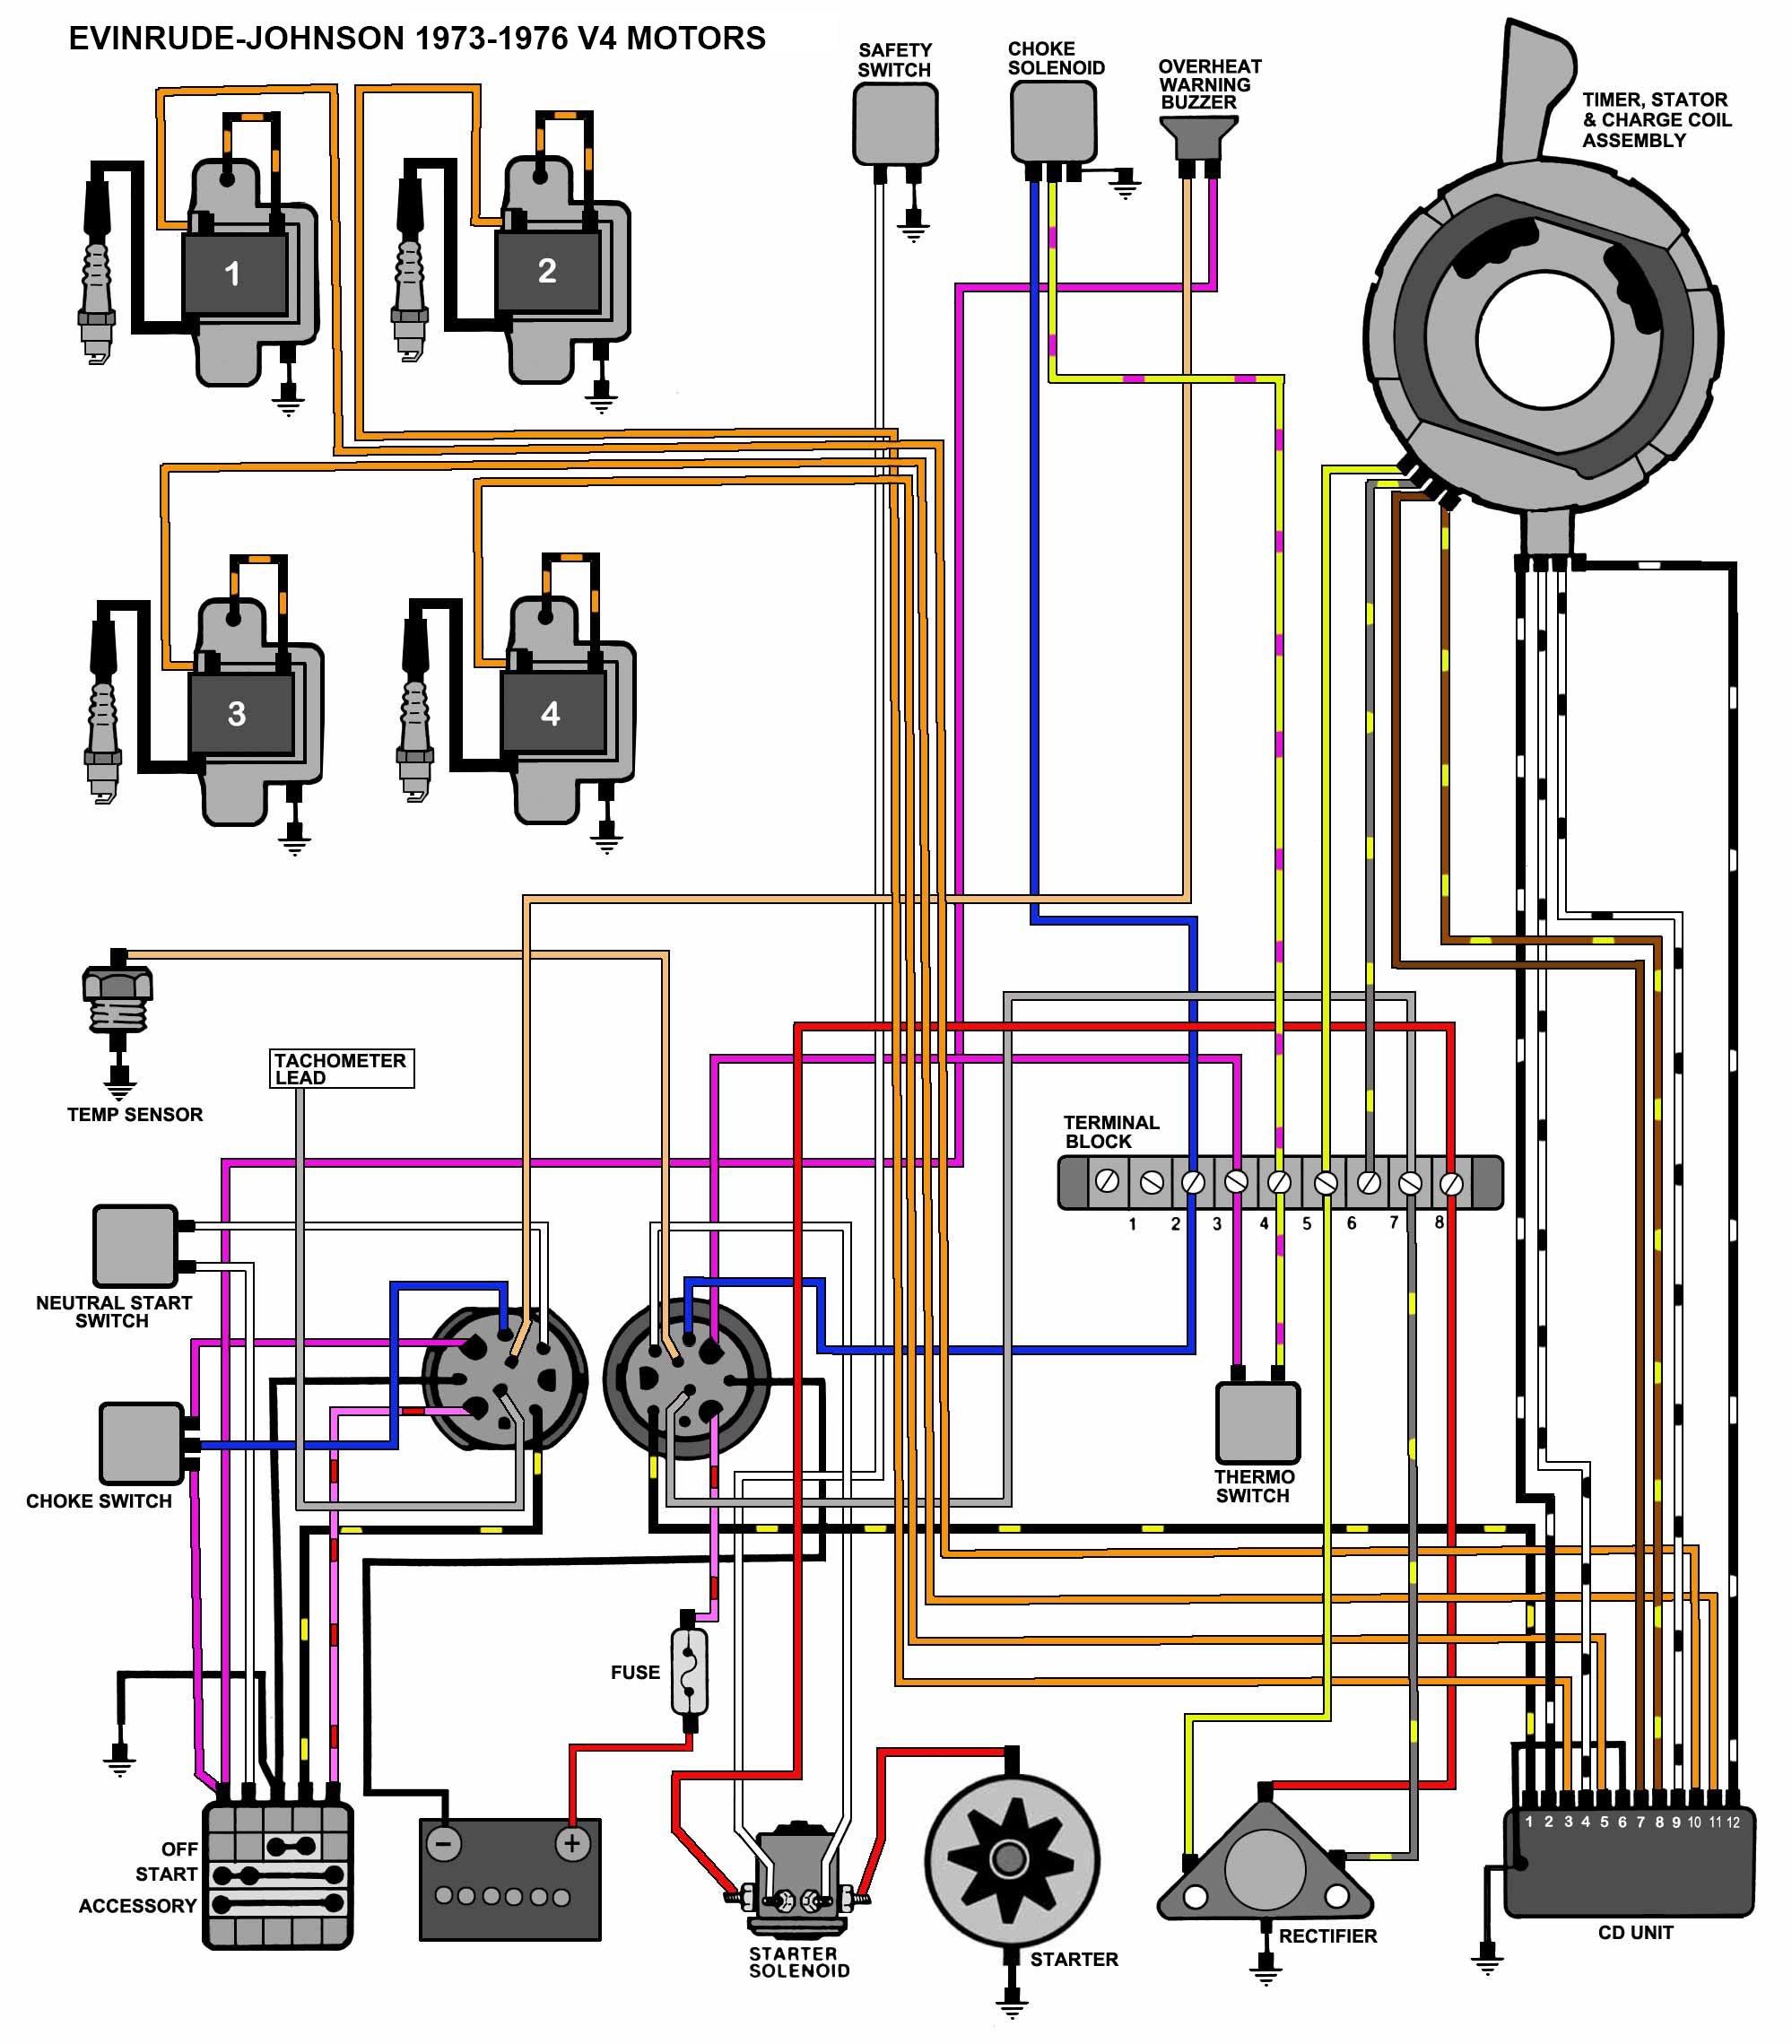 Evinrude Wiring Diagram Outboards - Evinrude Outboard Wiring Diagram New Evinrude Johnson Outboard Rh Lambdarepos org 4l